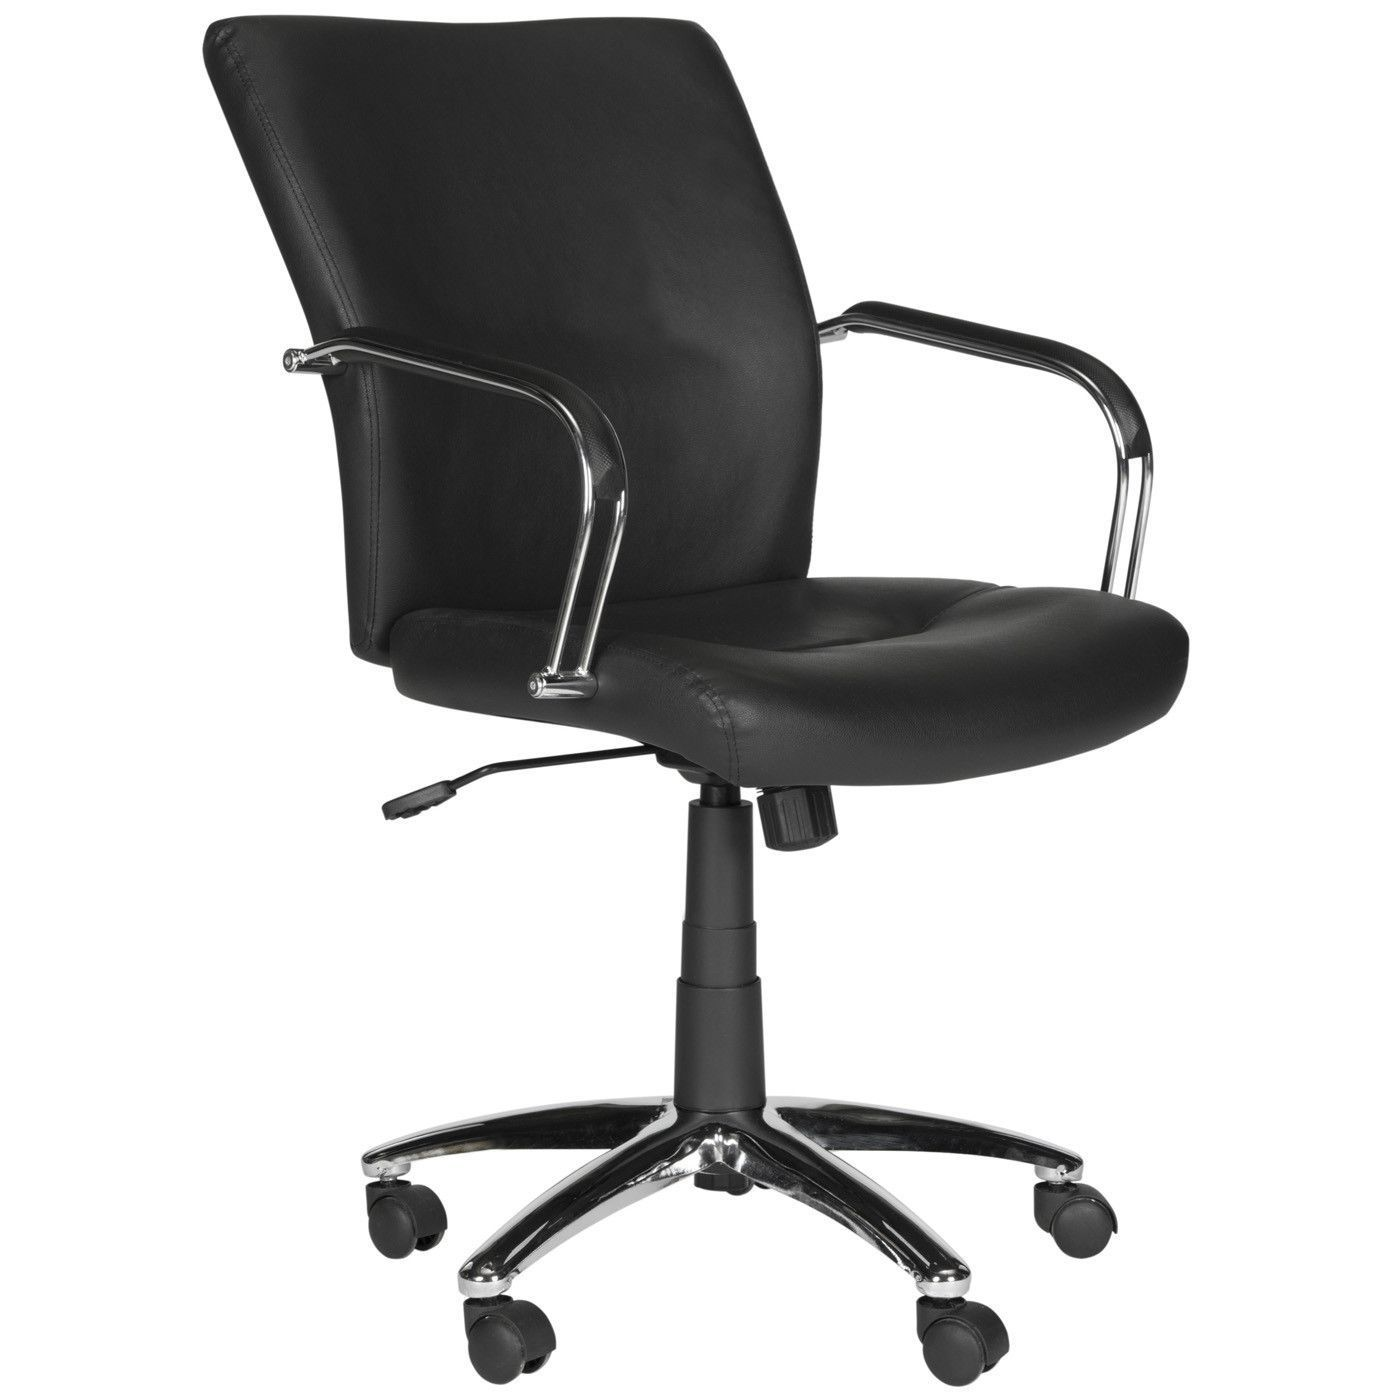 Lysette Desk Chair Black Office Chair Best Office Chair Desk Chair